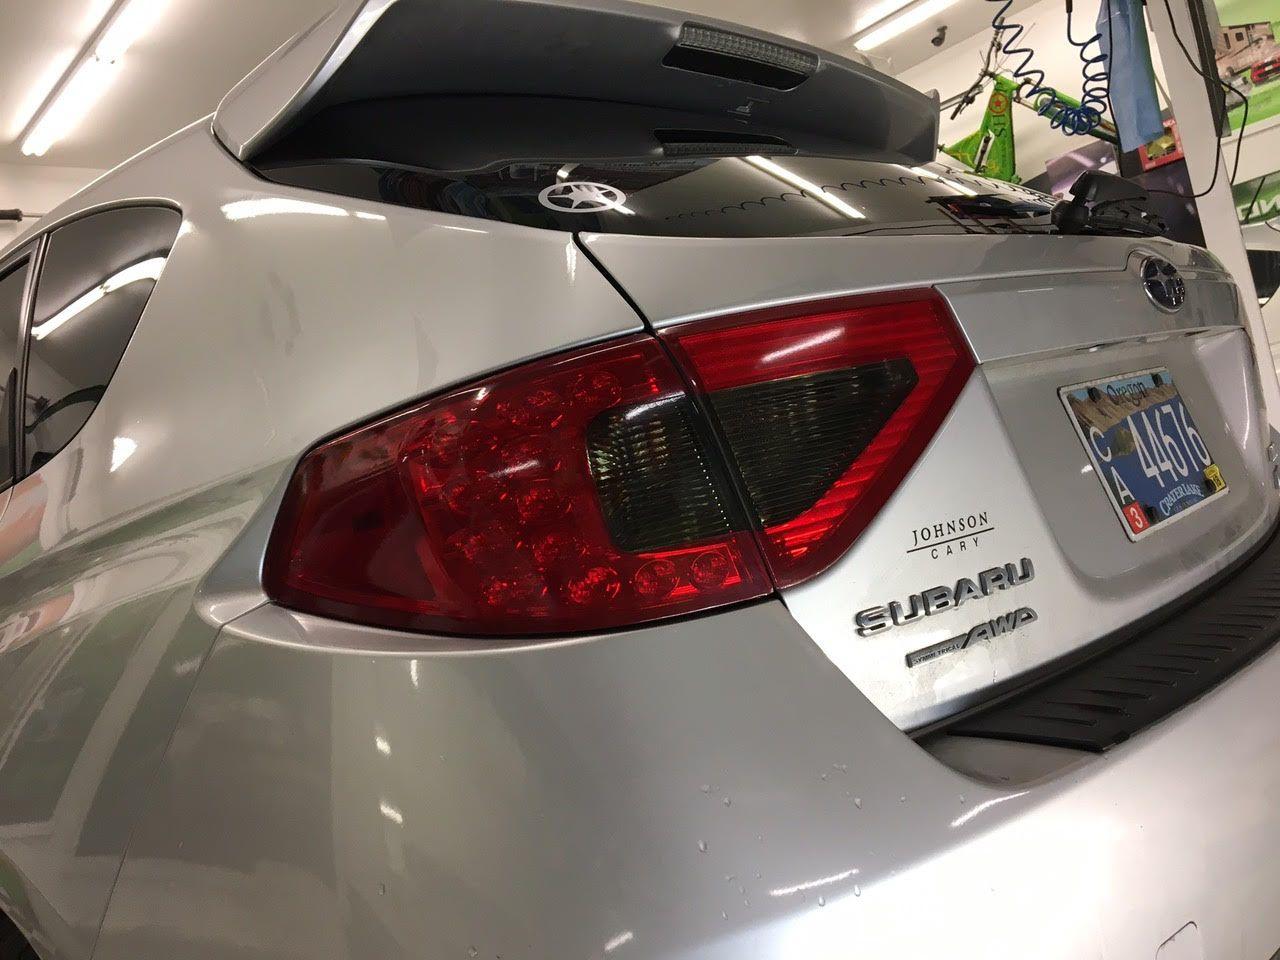 Loving the final look on this Subaru Impreza! We slammed